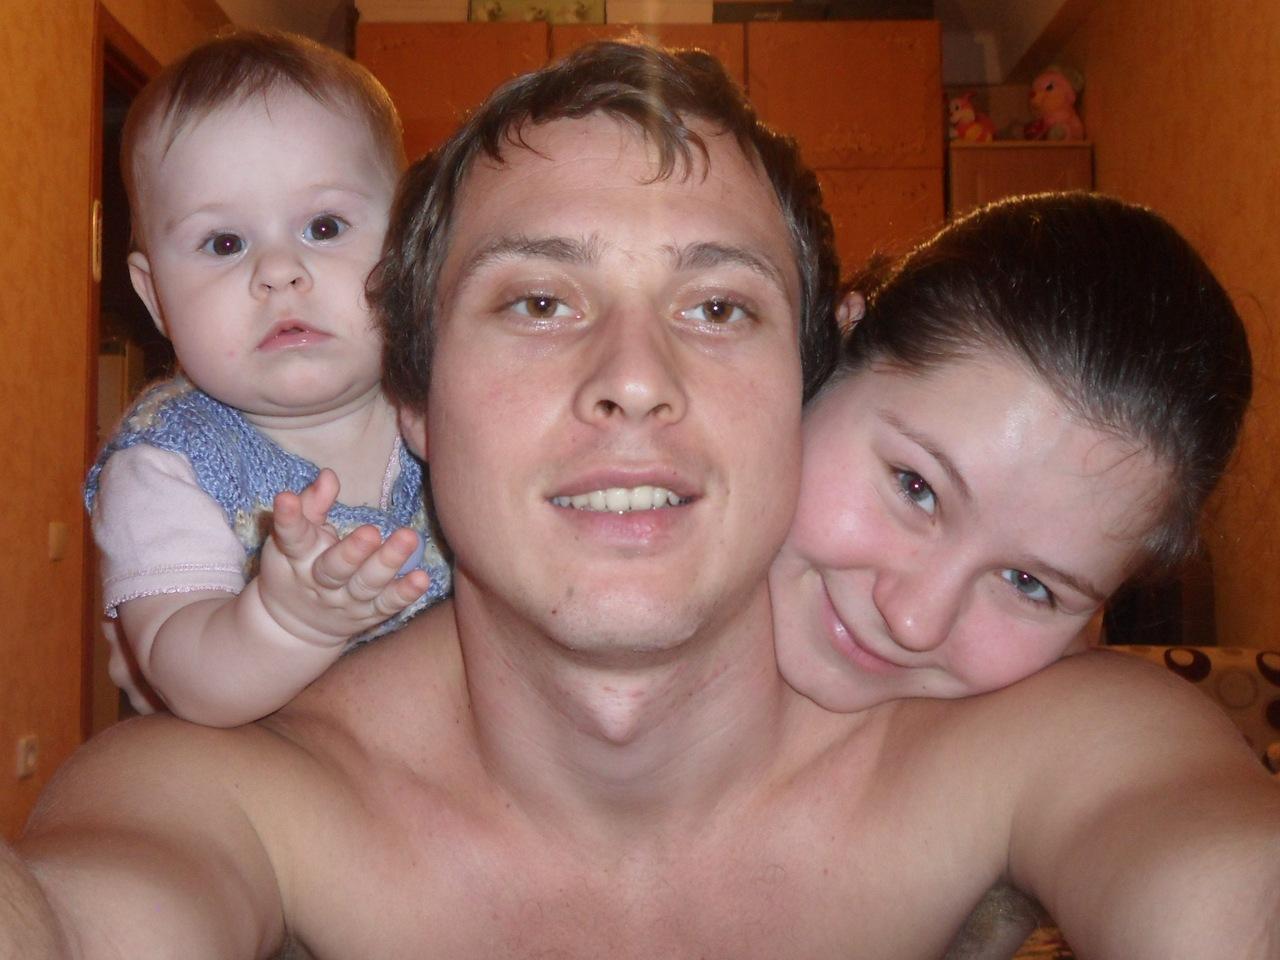 Наша семья. Мама, папа, я - счастливая семья!